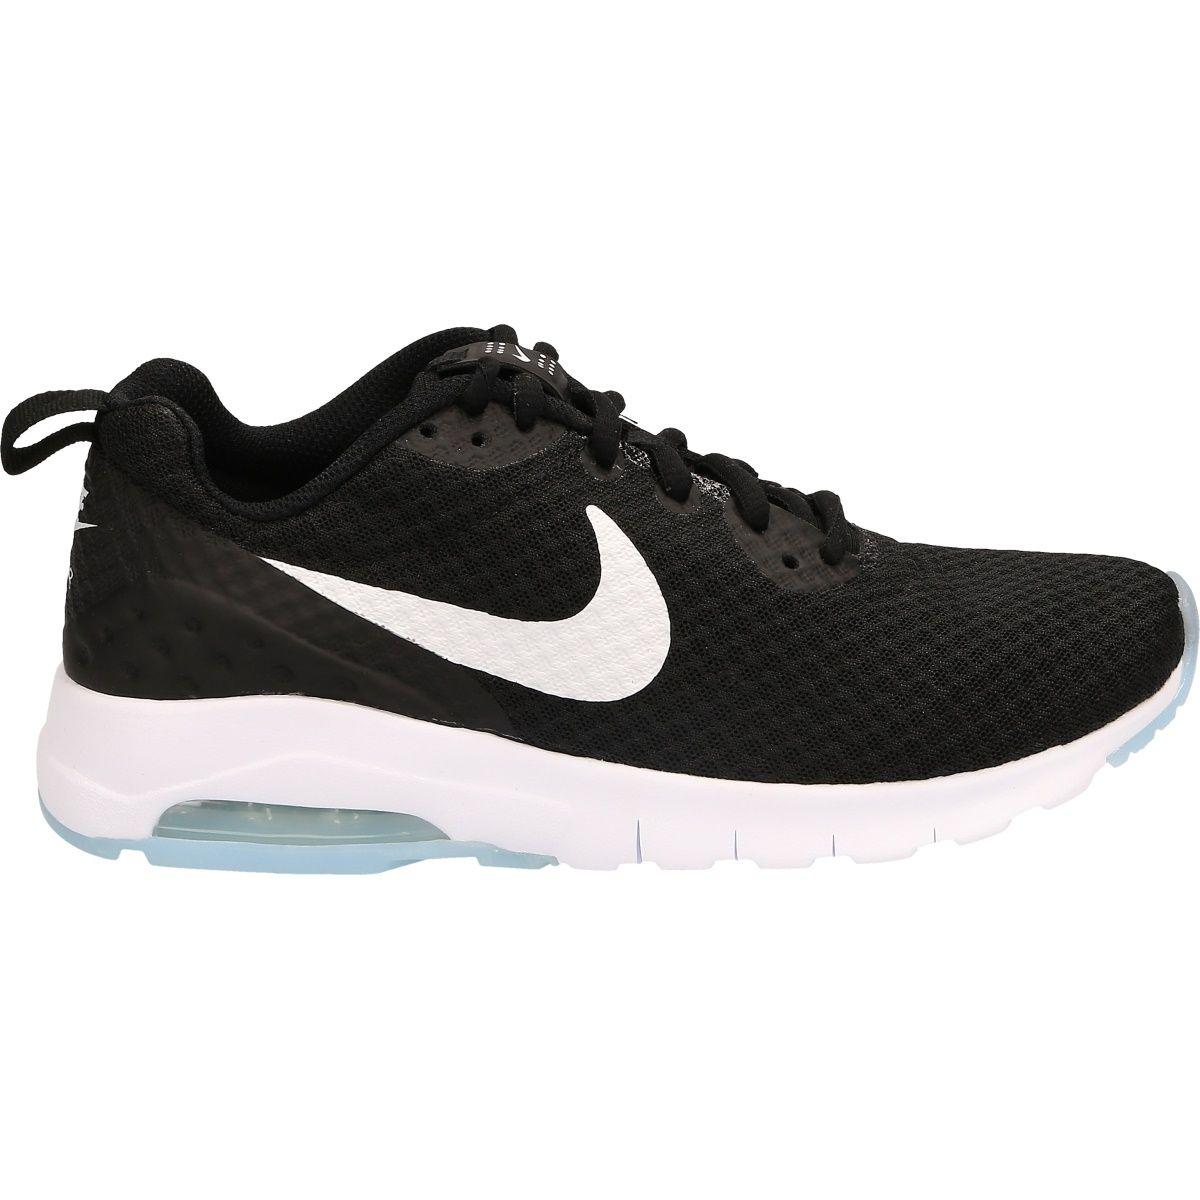 NIKE AIR MAX Motion LW Damen Sneaker Turnschuhe Sportschuhe